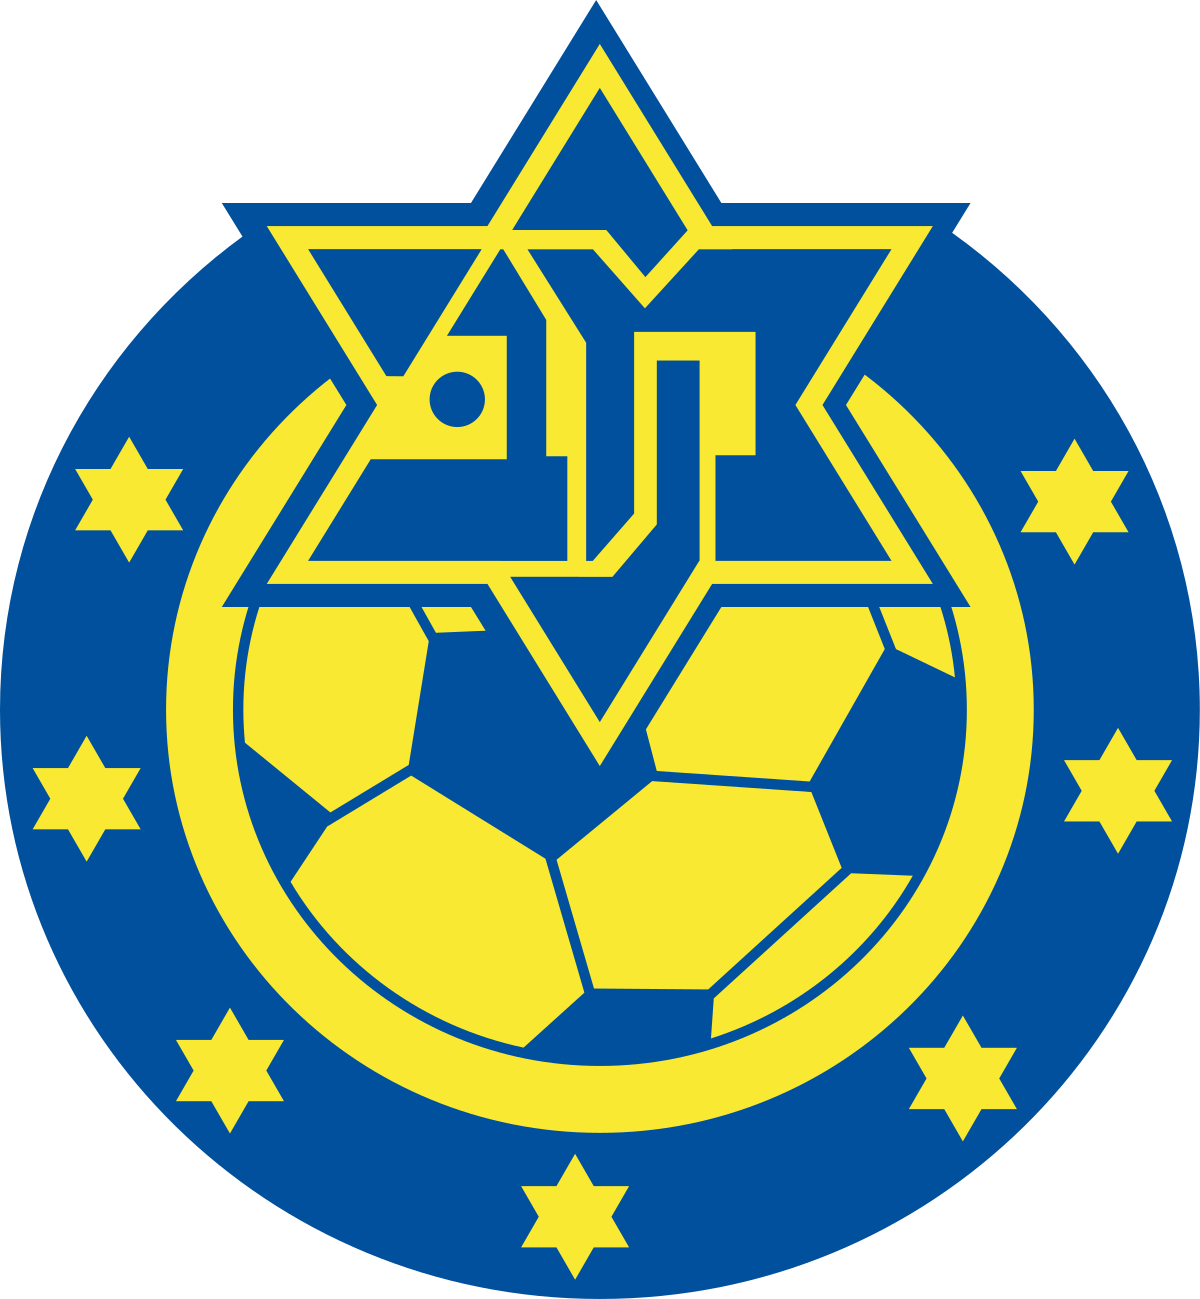 Macabi clipart jpg library stock Maccabi Herzliya F.C. - Wikipedia jpg library stock